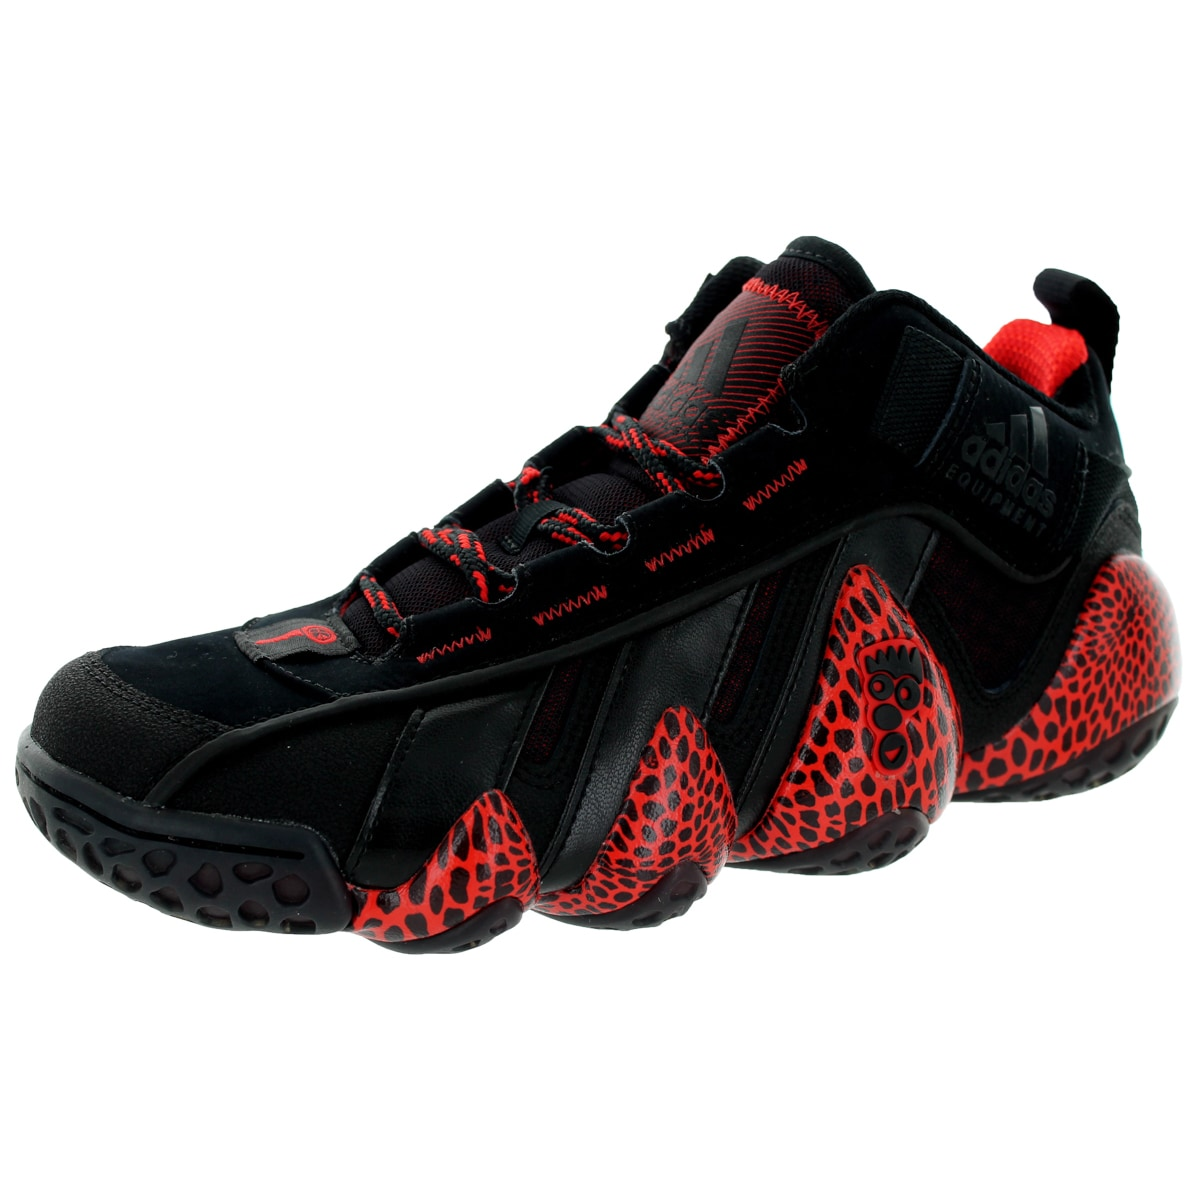 7968e877f36f Shop Adidas Men s Eqt Key Trainer Black Black Poppy Training Shoe - Free  Shipping Today - Overstock - 12346838